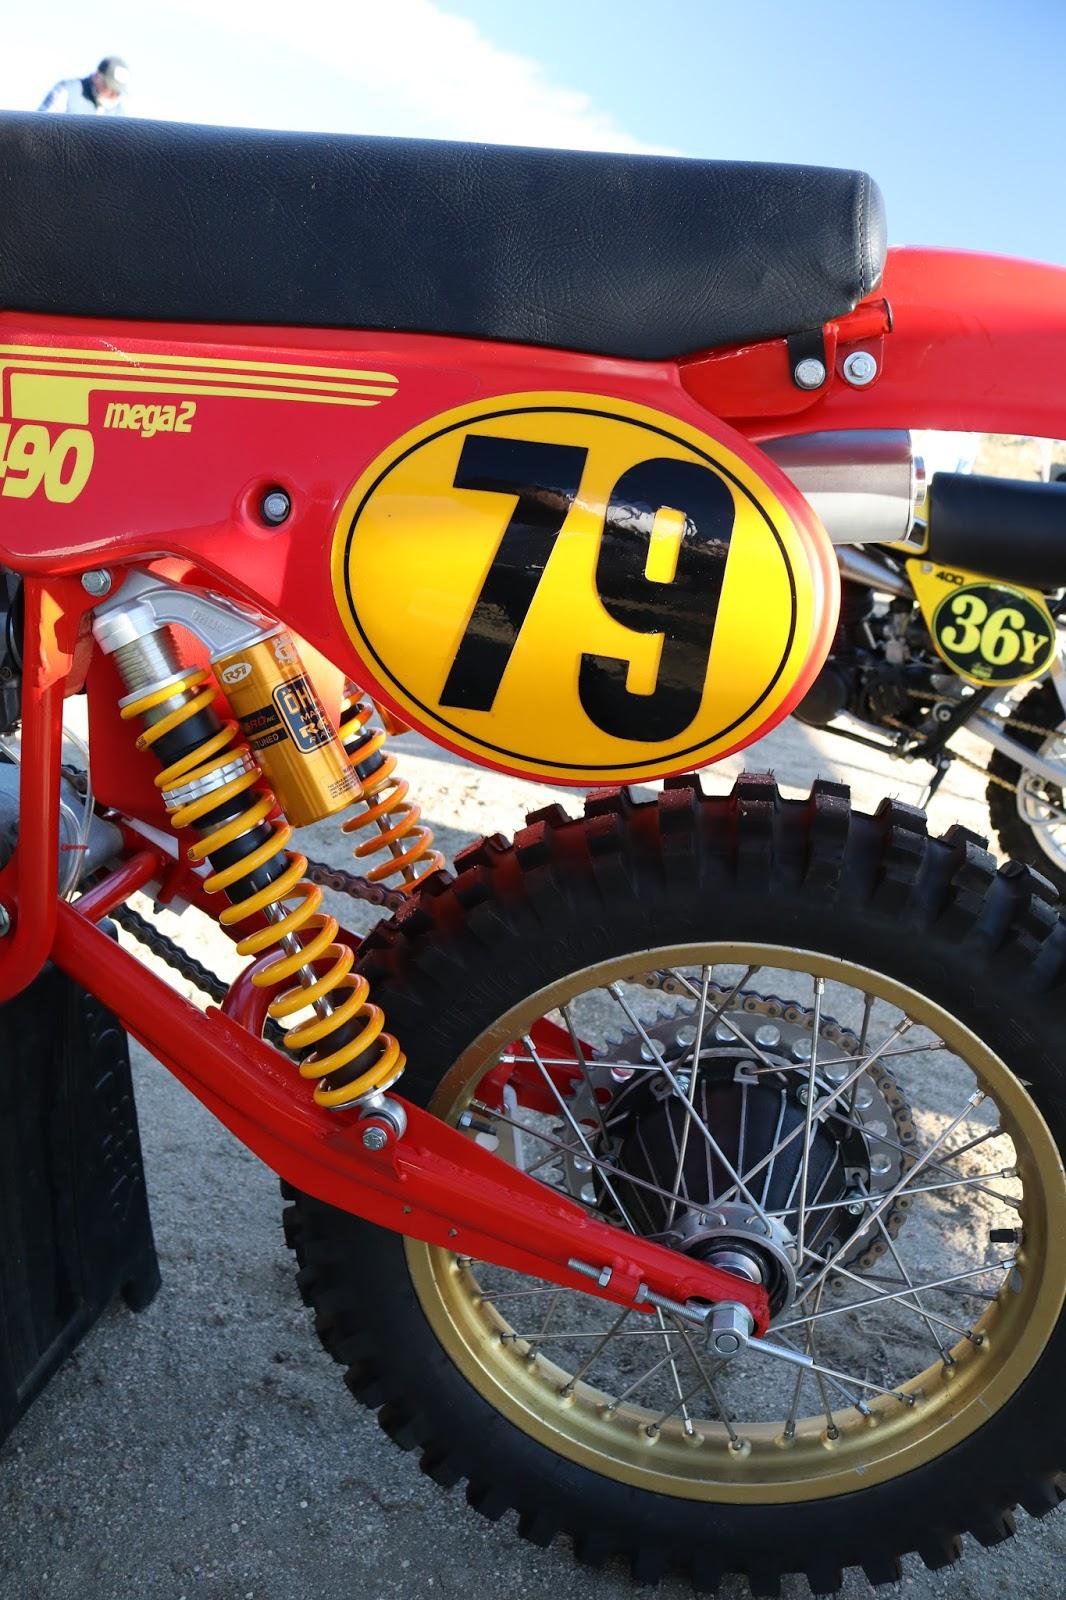 Maico 490 Mega 2 79 Raced At The Rocky Mountain Vintage MX Colorado Springs